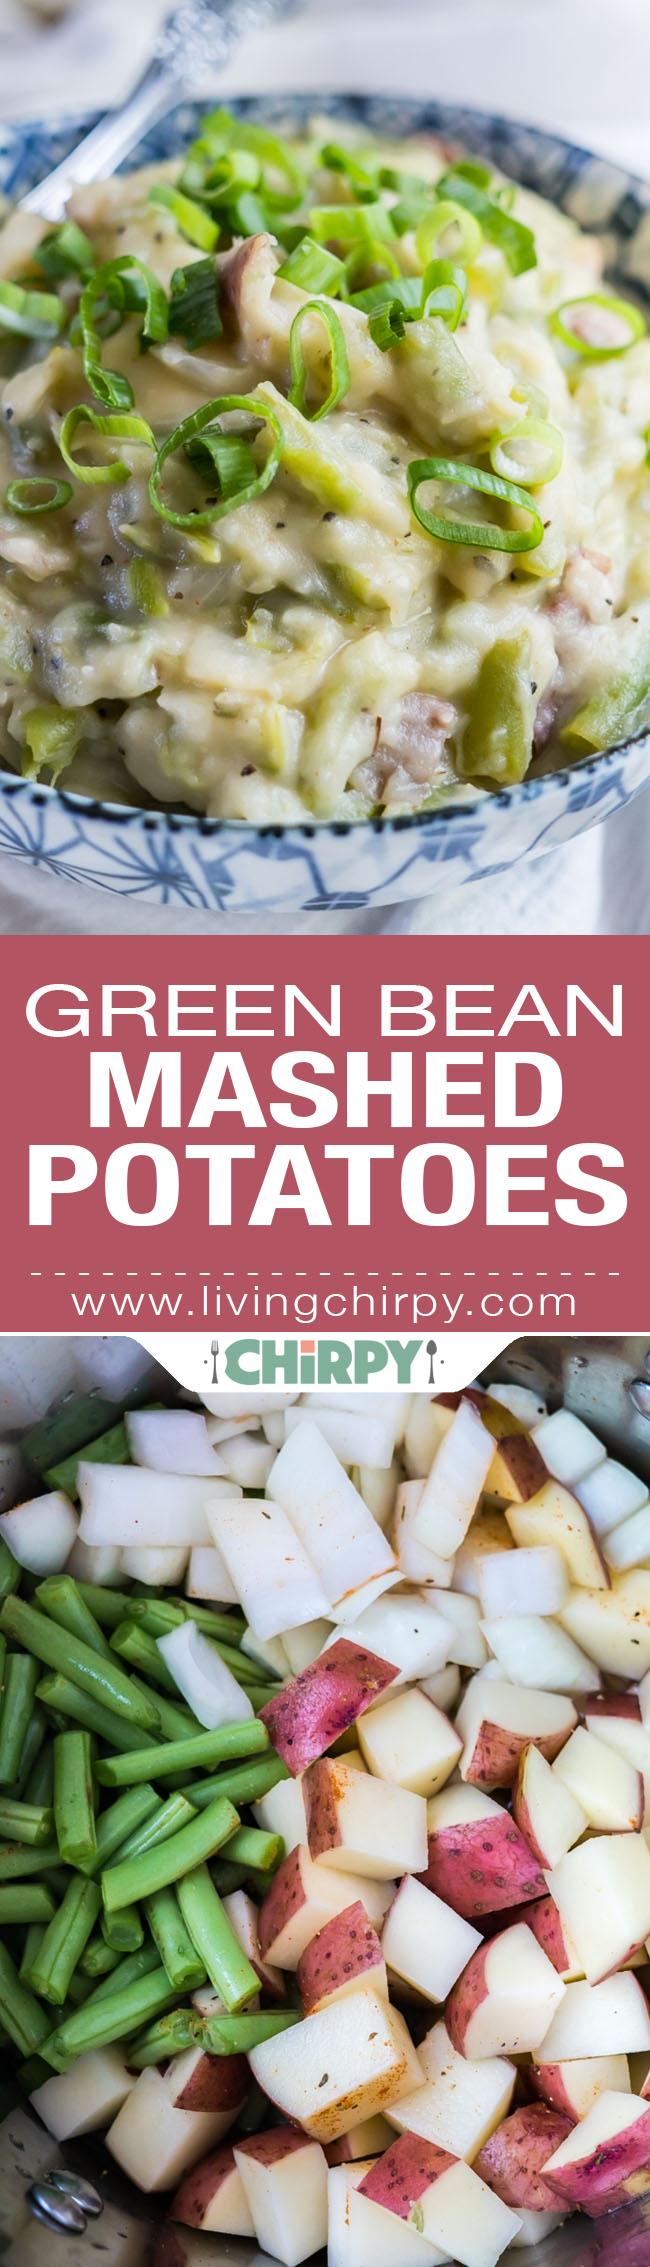 Green-Bean-Mashed-Potatoes-Pin